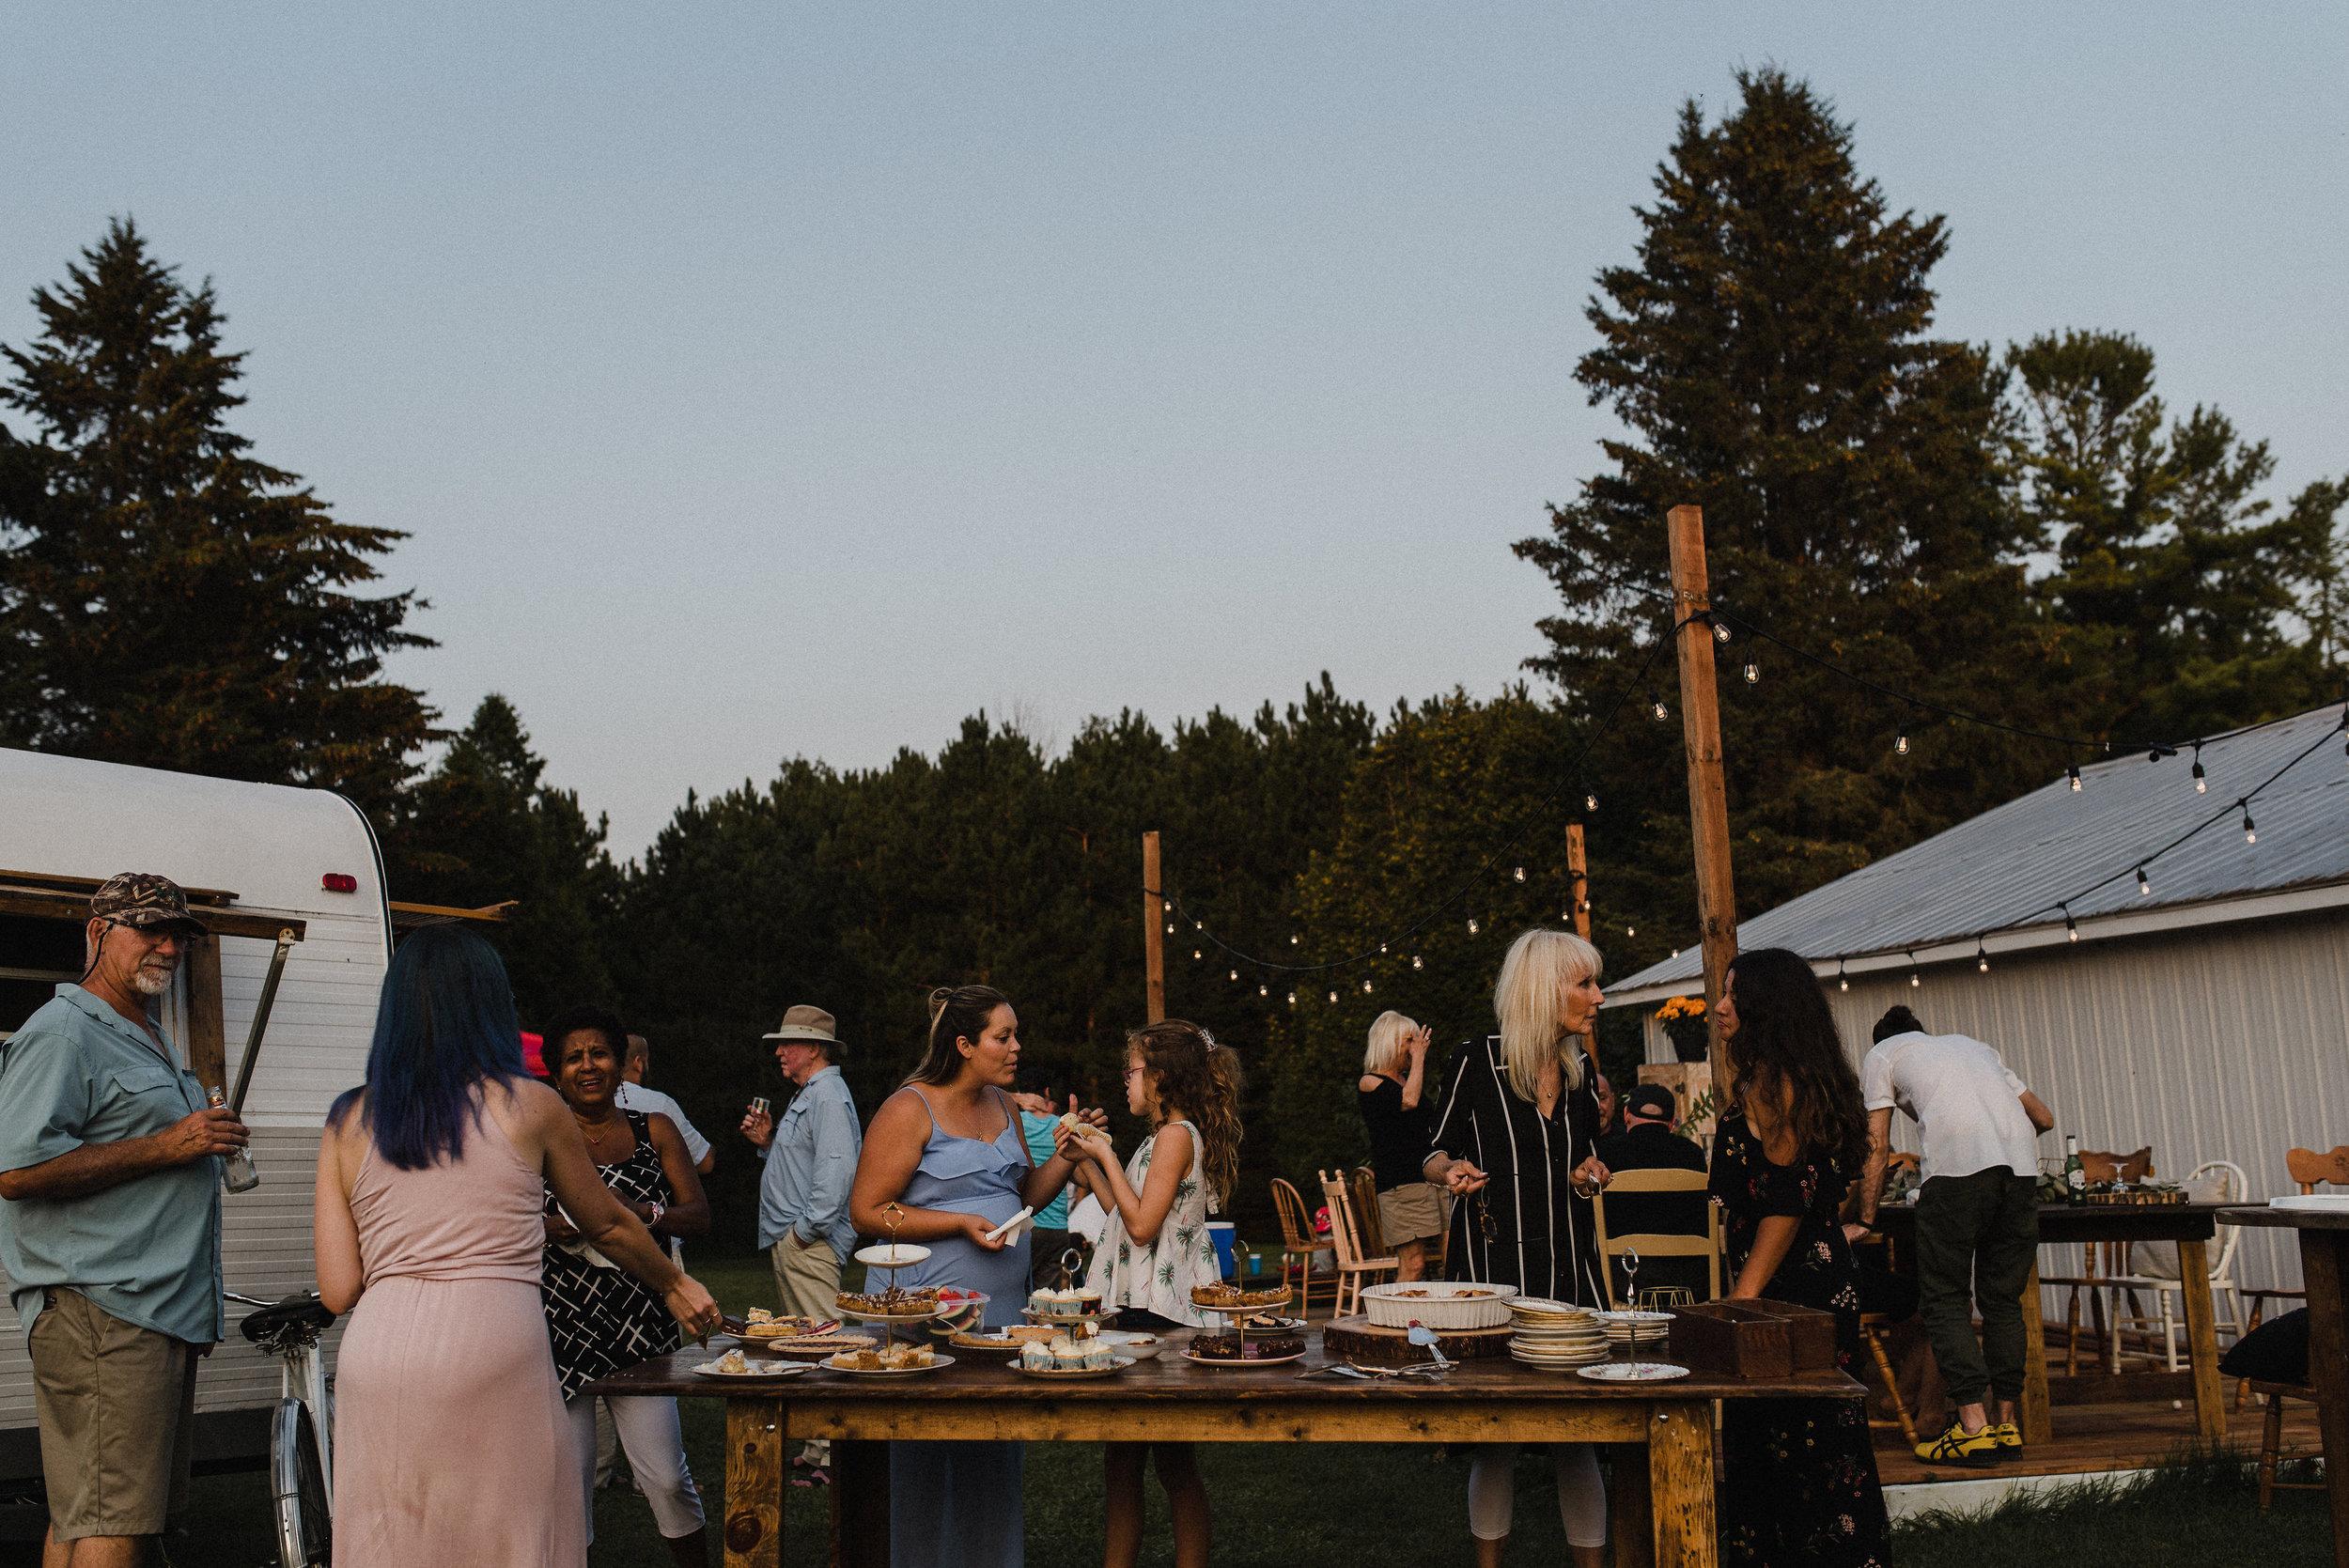 victoria_lafleur_backyard_supper_summer-159.jpg